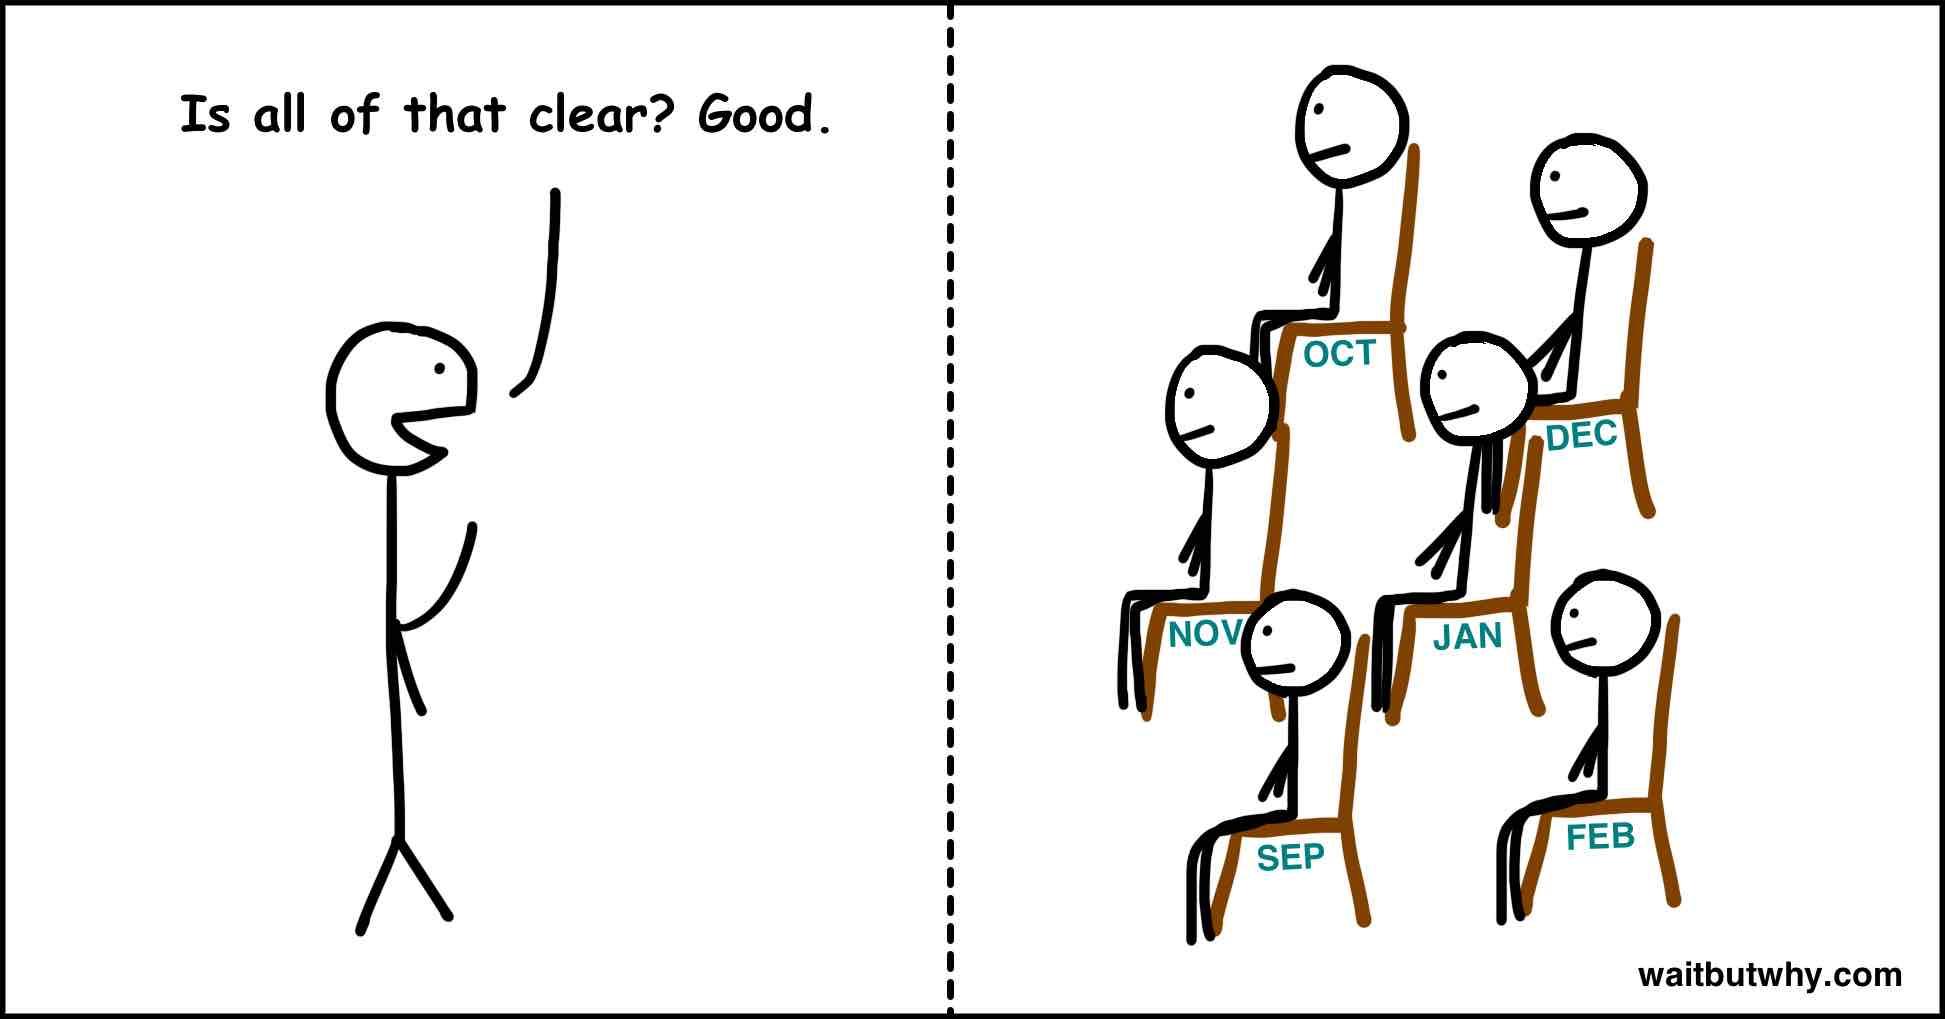 Aug Tim instructions 4